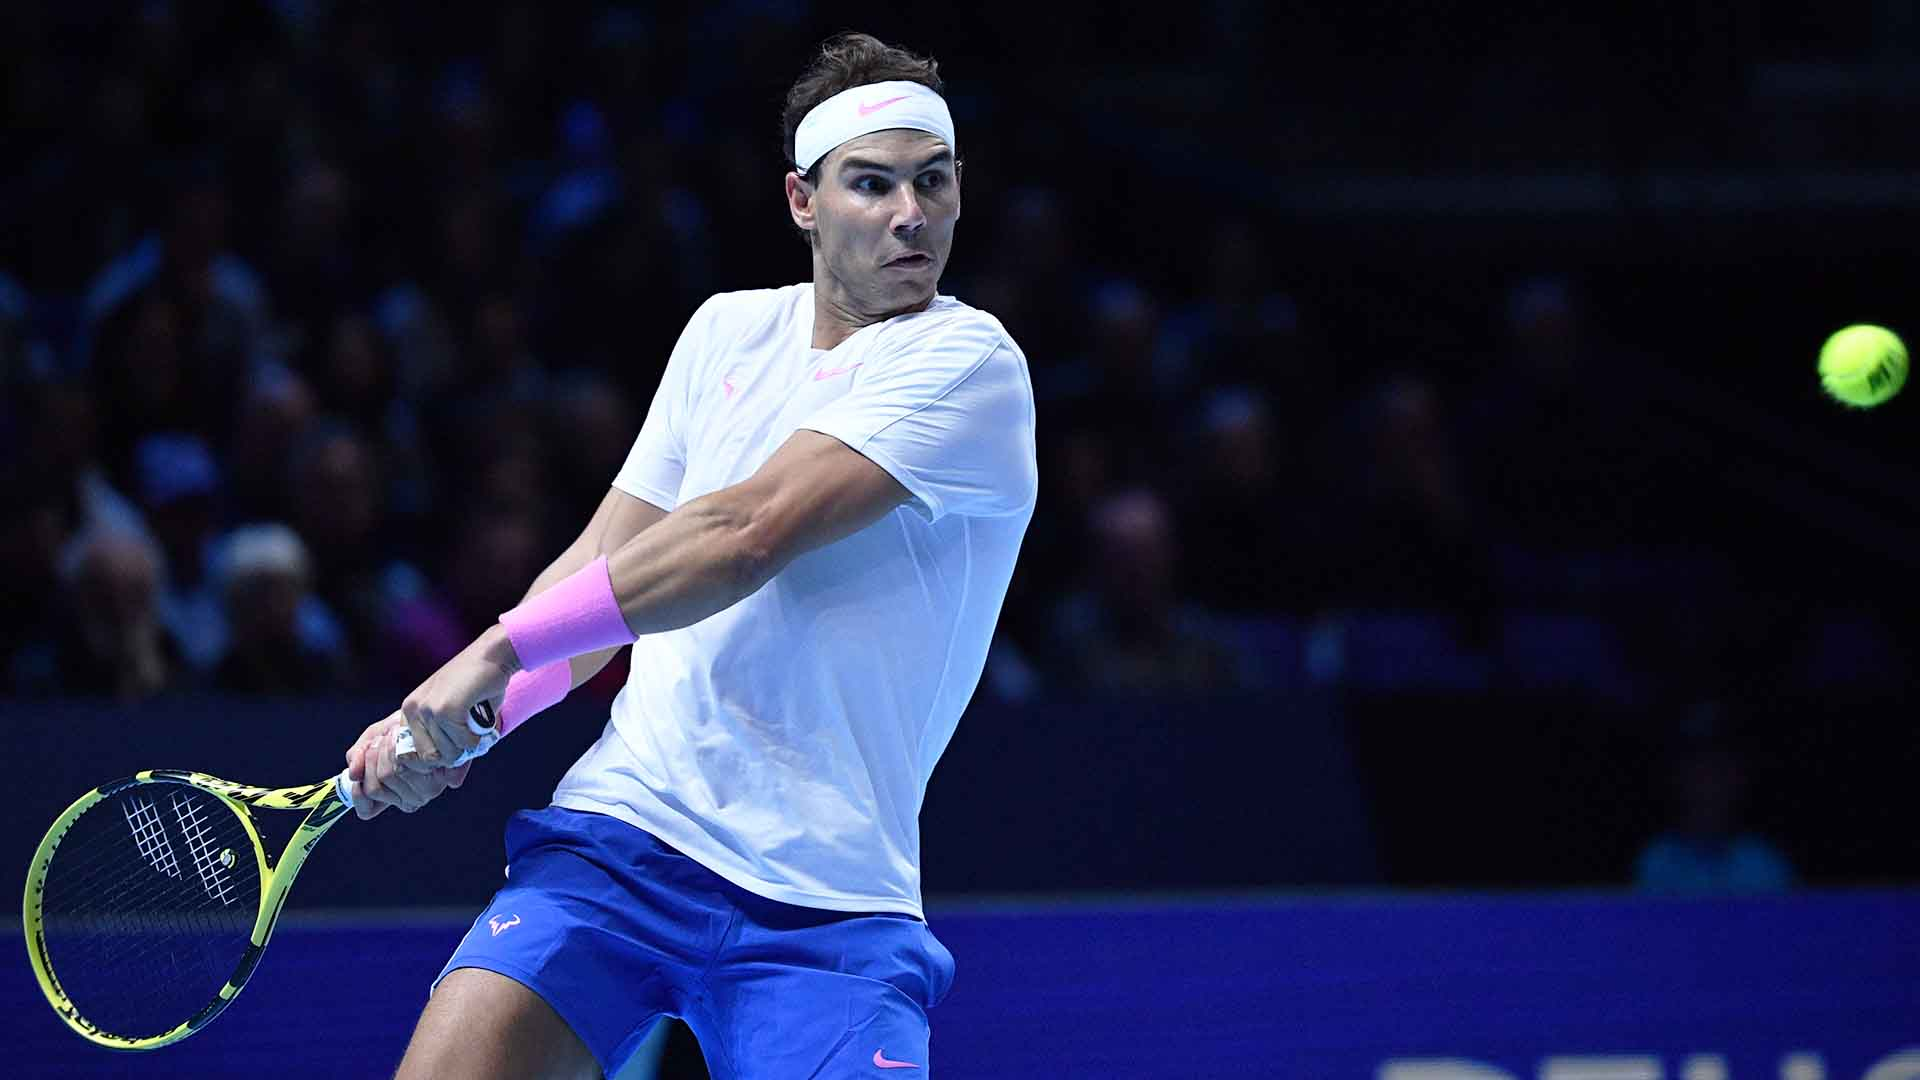 <a href='https://www.atptour.com/en/players/rafael-nadal/n409/overview'>Rafael Nadal</a> broke serve on two occasions to beat <a href='https://www.atptour.com/en/players/stefanos-tsitsipas/te51/overview'>Stefanos Tsitsipas</a> in three sets at the <a href='https://www.atptour.com/en/tournaments/nitto-atp-finals/605/overview'>Nitto ATP Finals</a> on Friday.